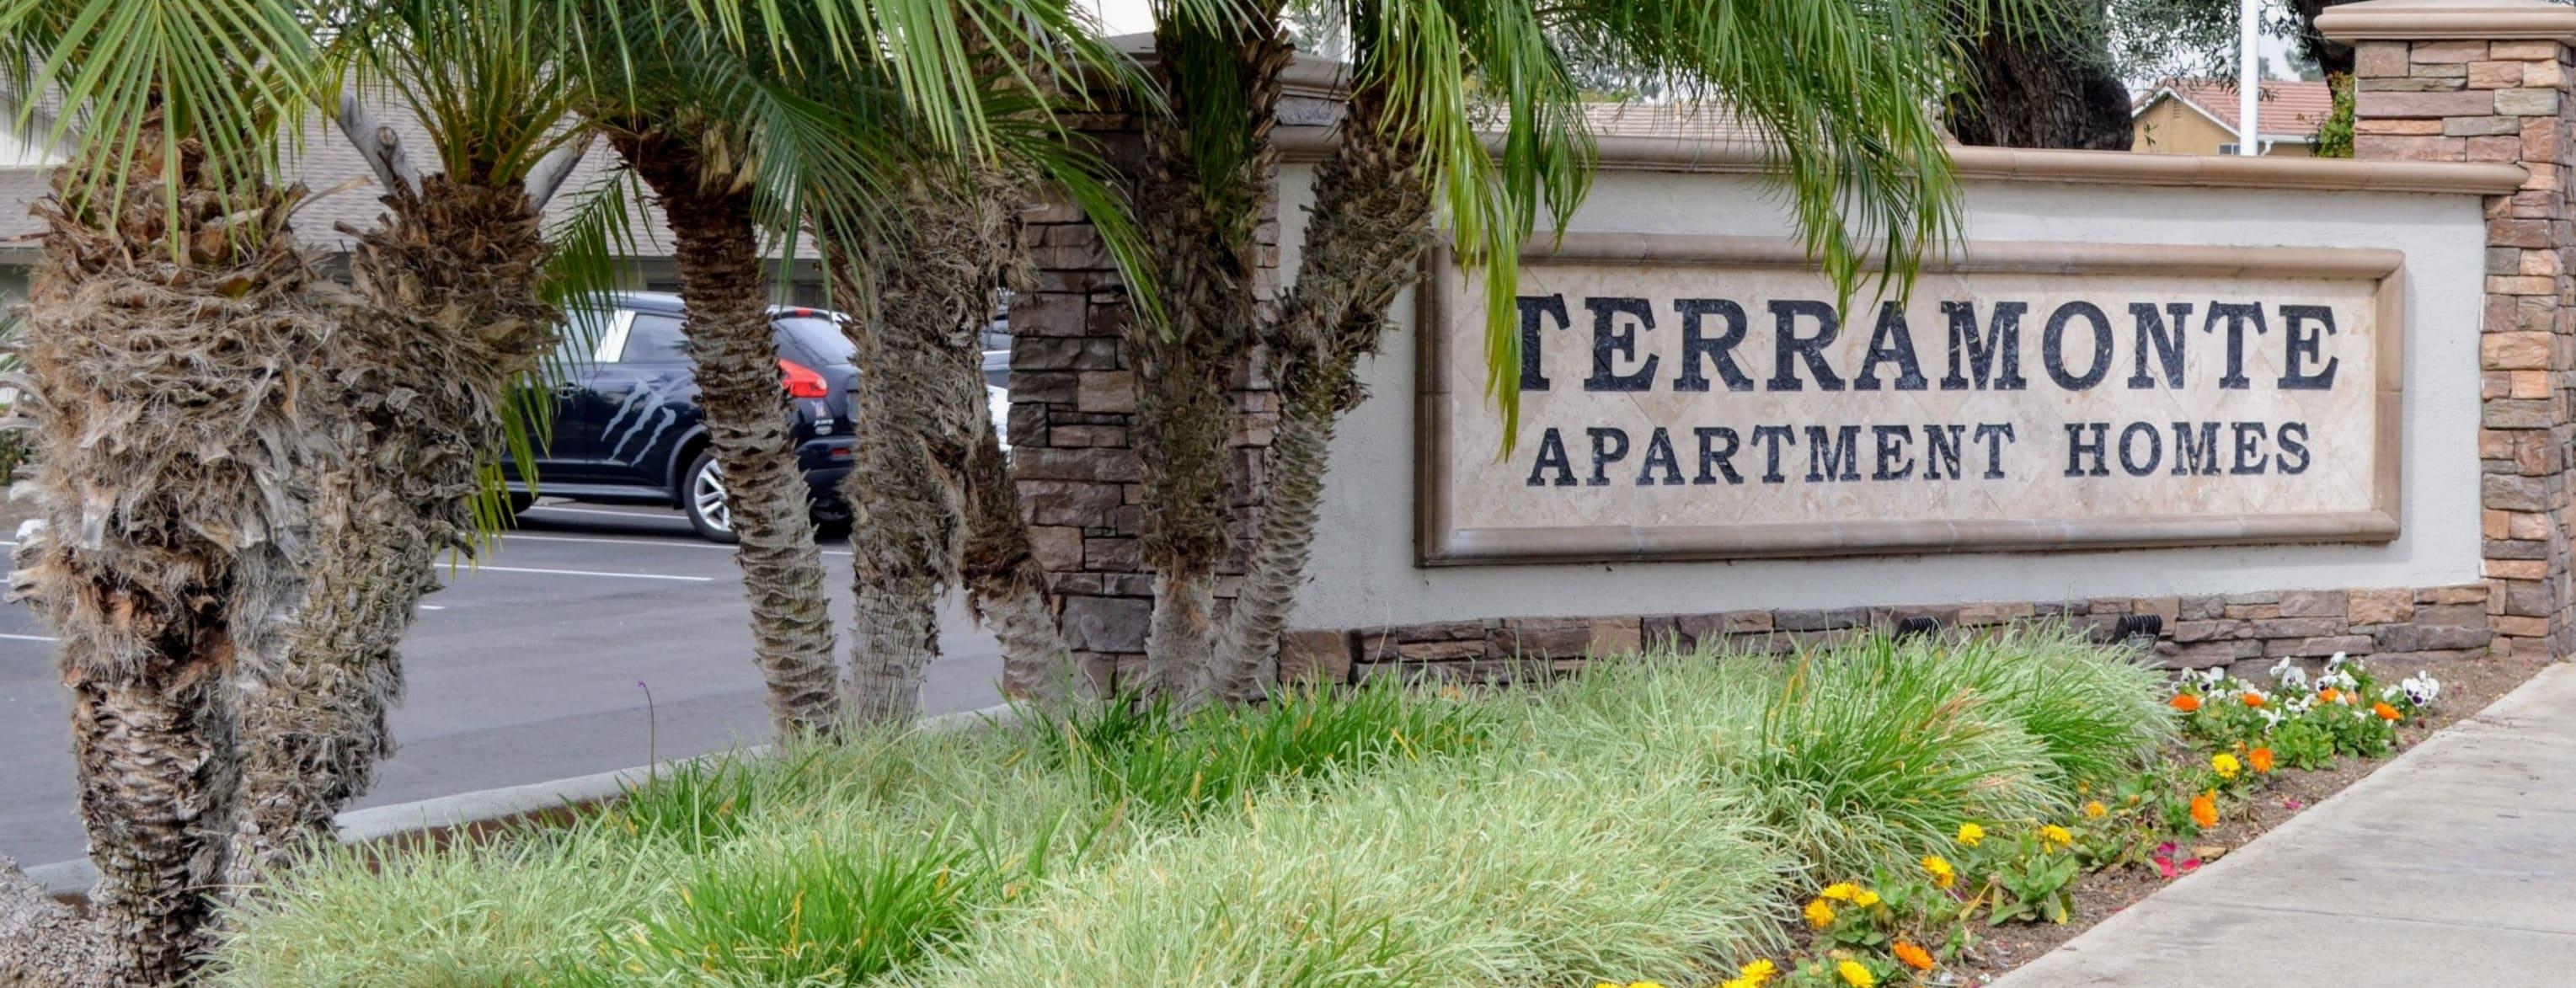 GrandEntrance at Terramonte Apartment Homes, Pomona, California